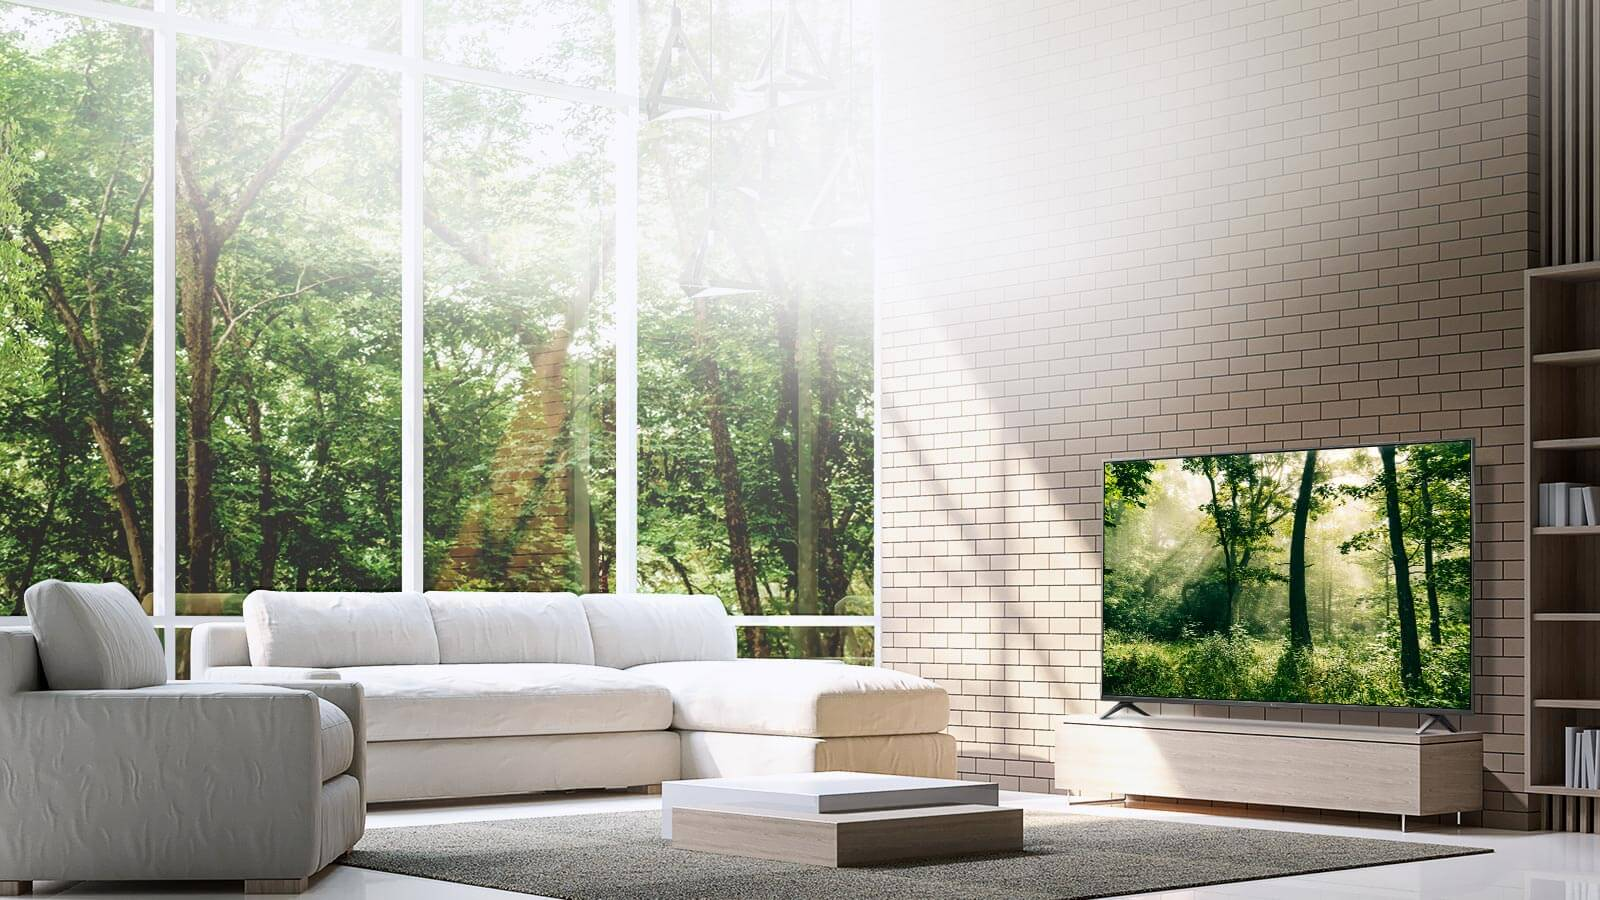 LG SK8000 Super UHD 4K HDR Premium Smart LED TV with Freeview Play - Brilliant Titan display environment